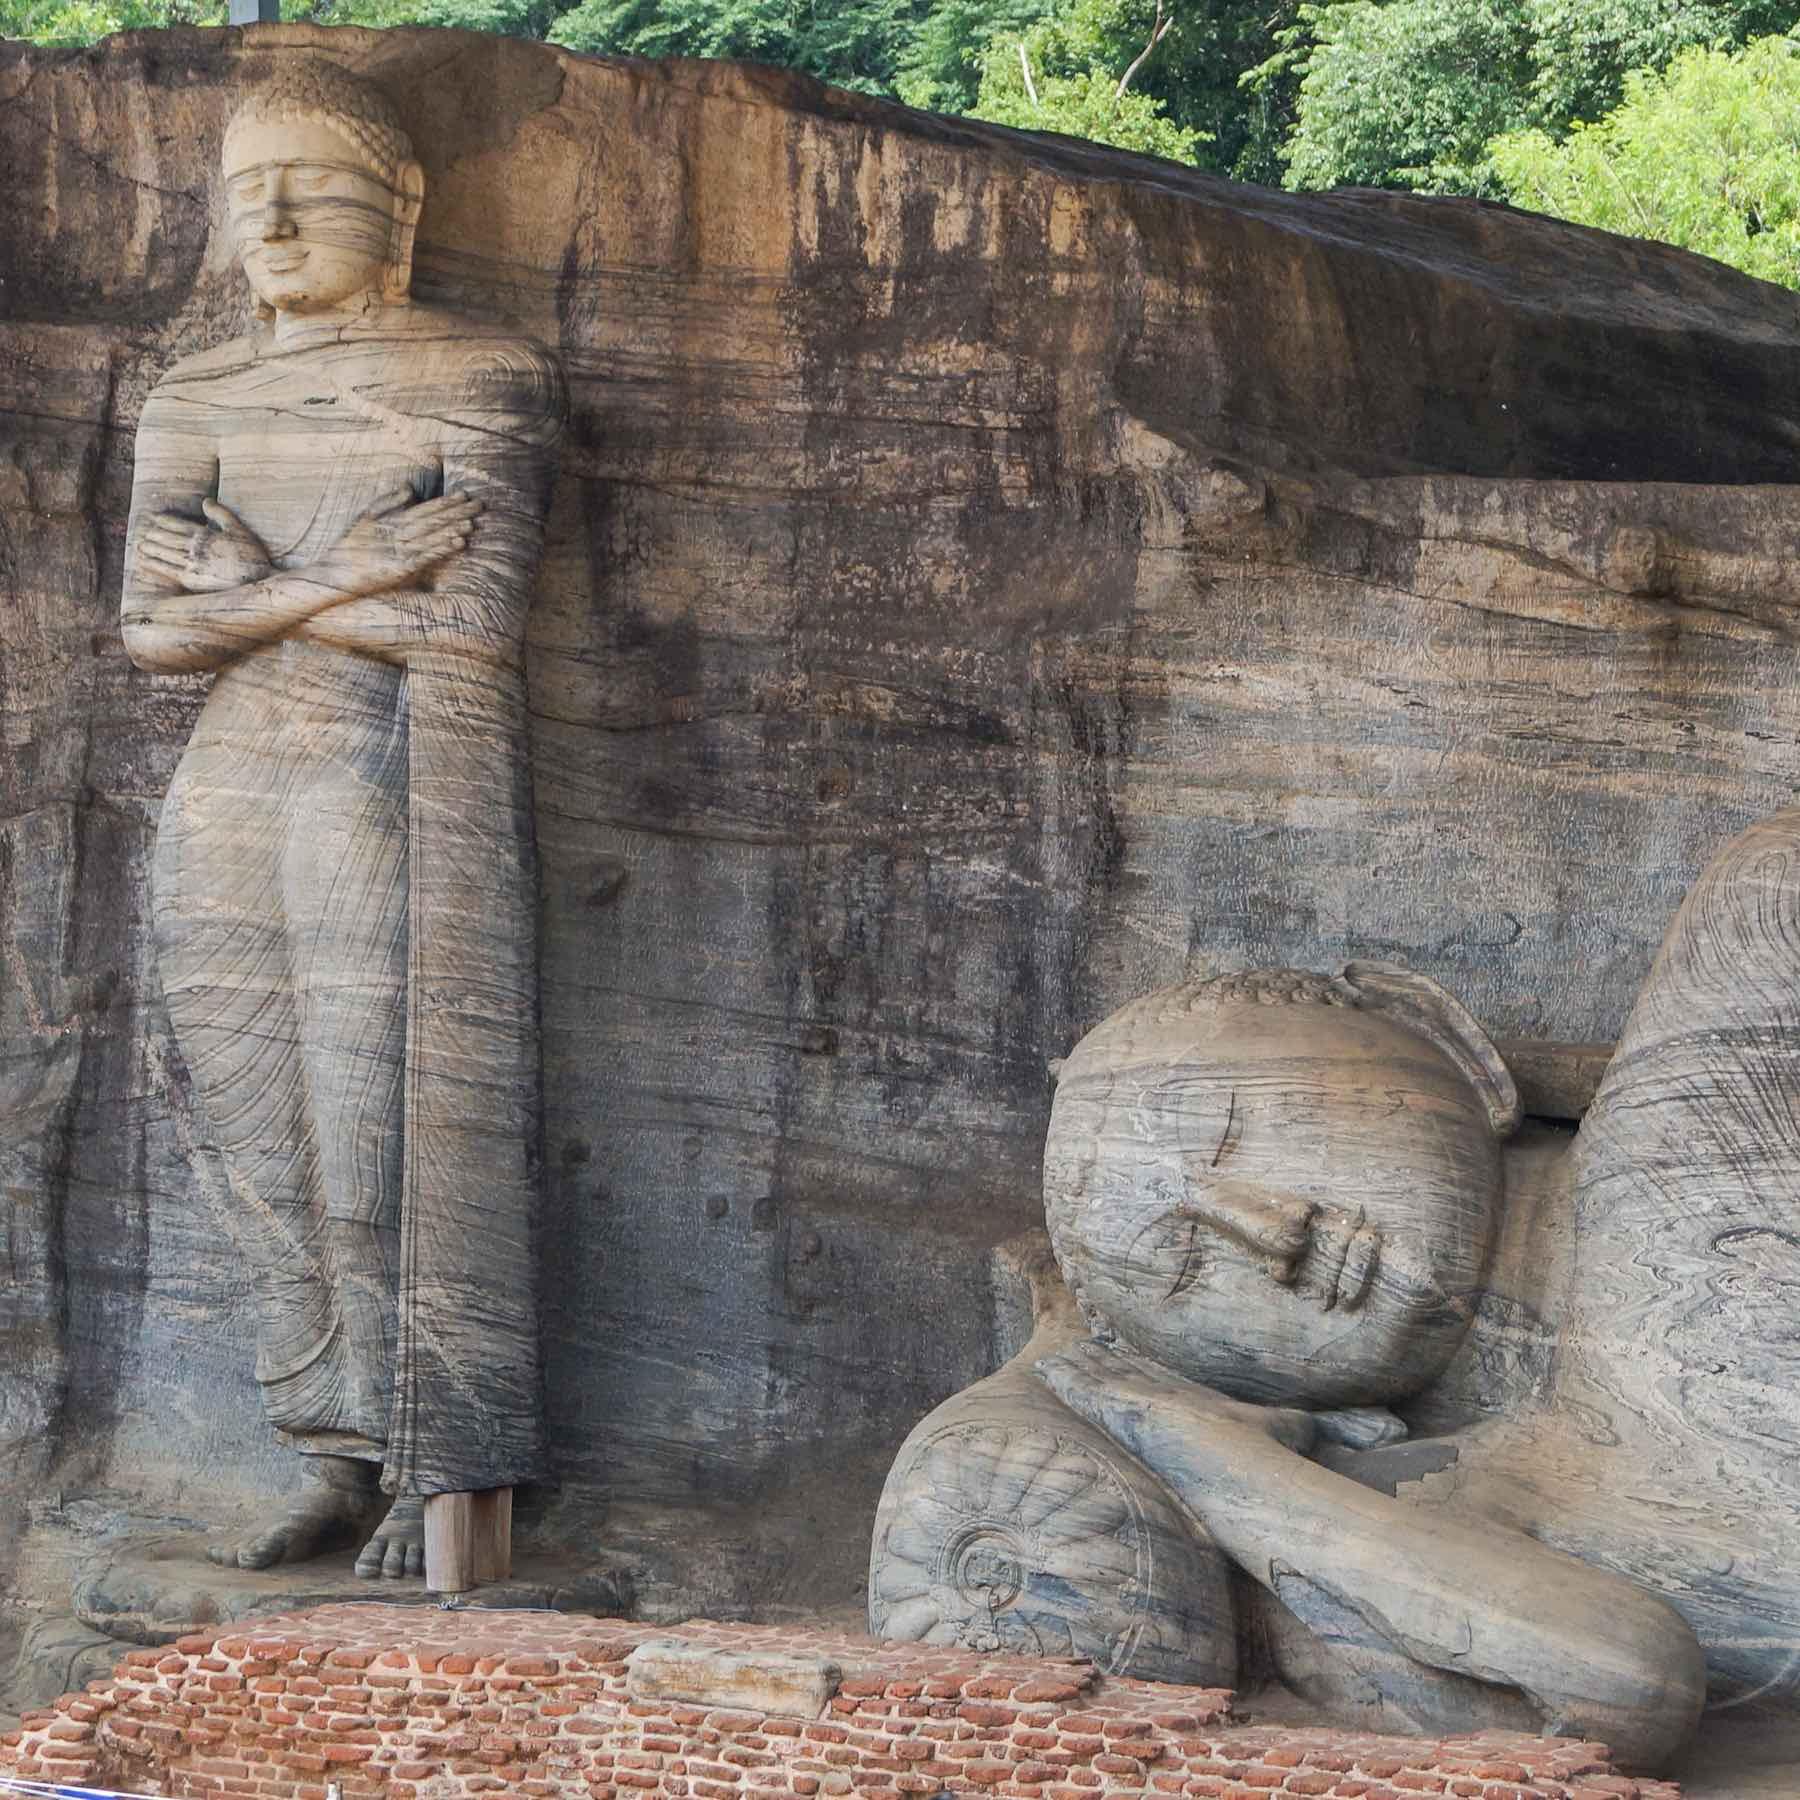 Gal Viharau0027s standing and reclining Buddha sculptures & The Aukana Buddha: Sri Lankau0027s Colossal Standing Rock Statue ... islam-shia.org